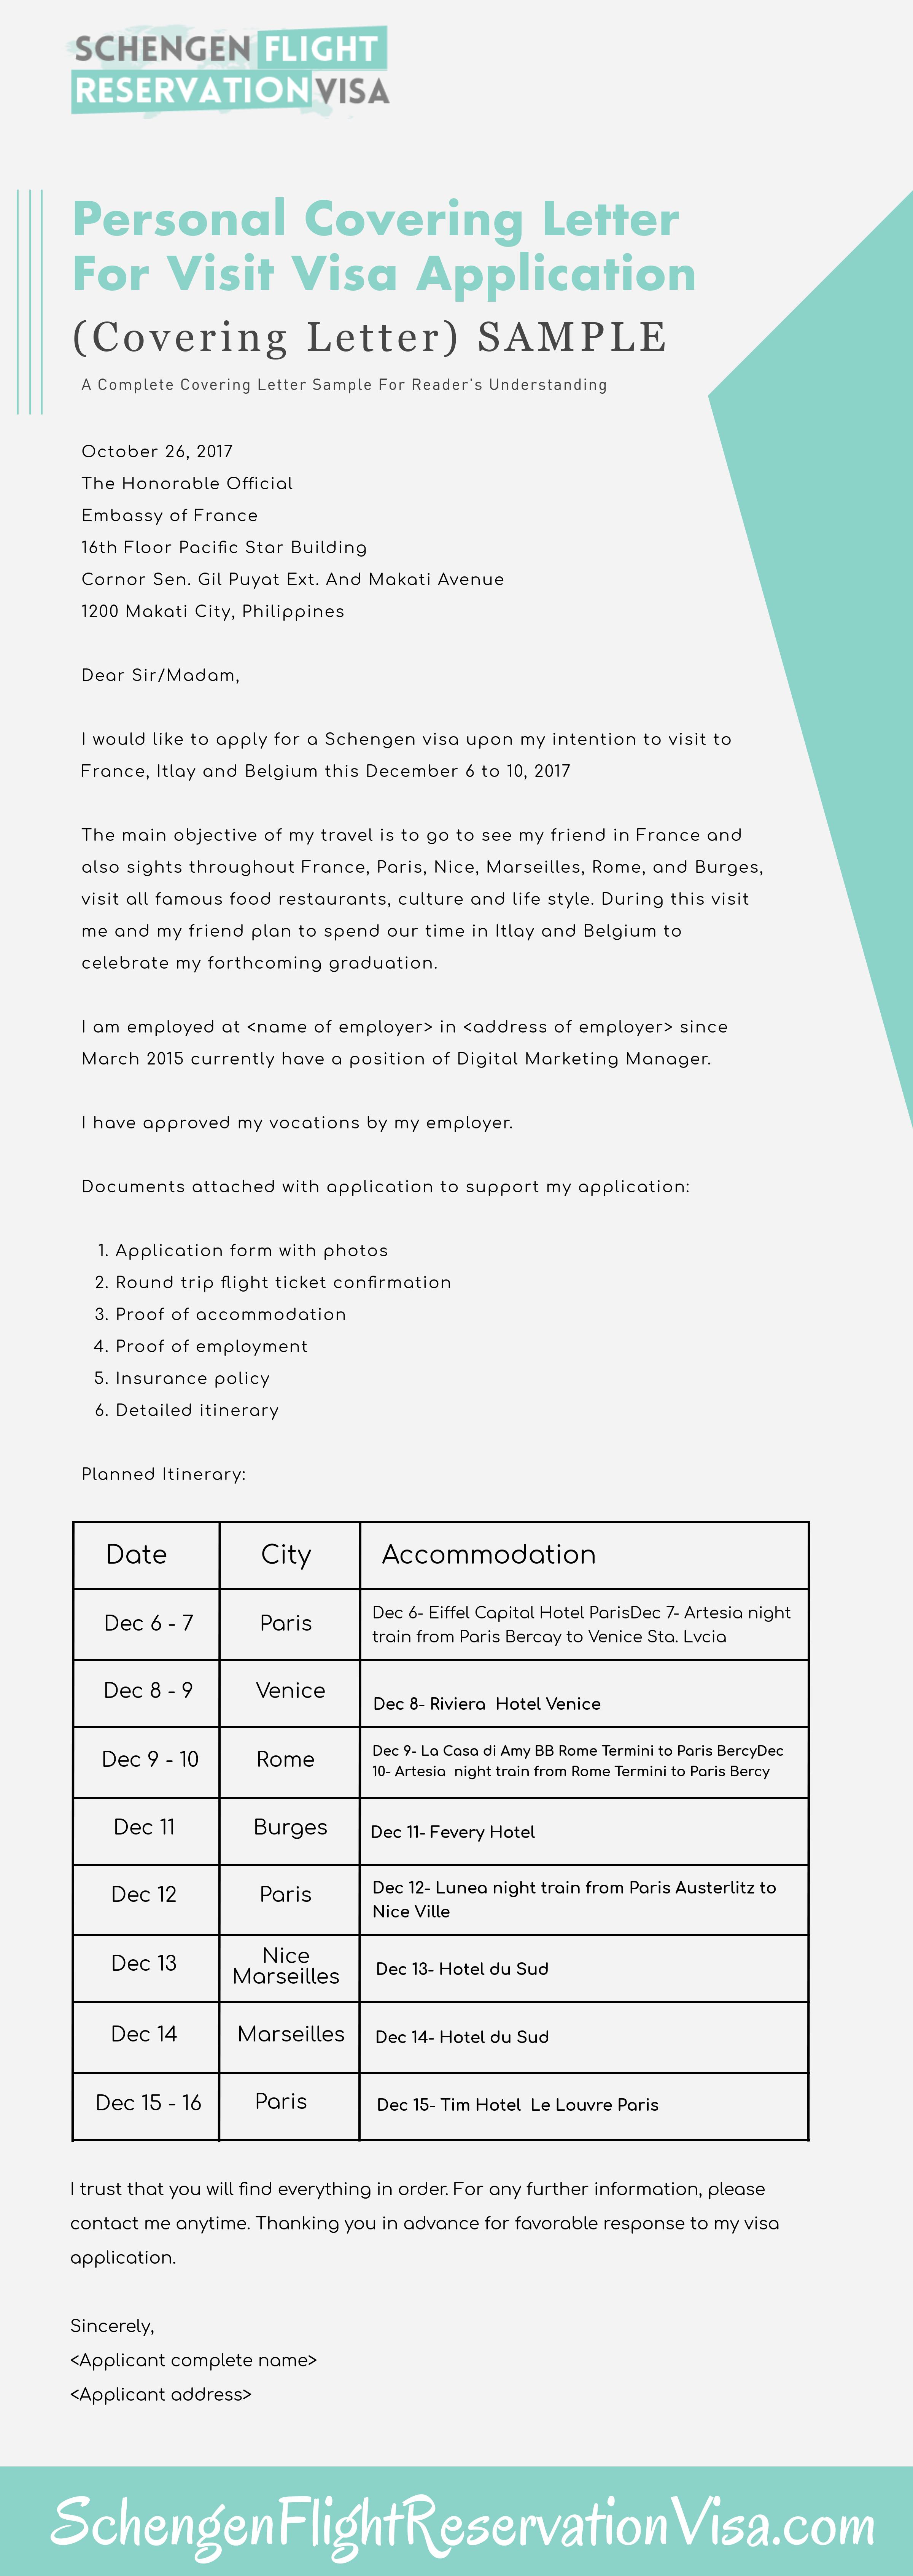 pin by schengenflightreservationvisa on schengen visa engineering manager resume template nurse practitioner curriculum vitae simple cv docx